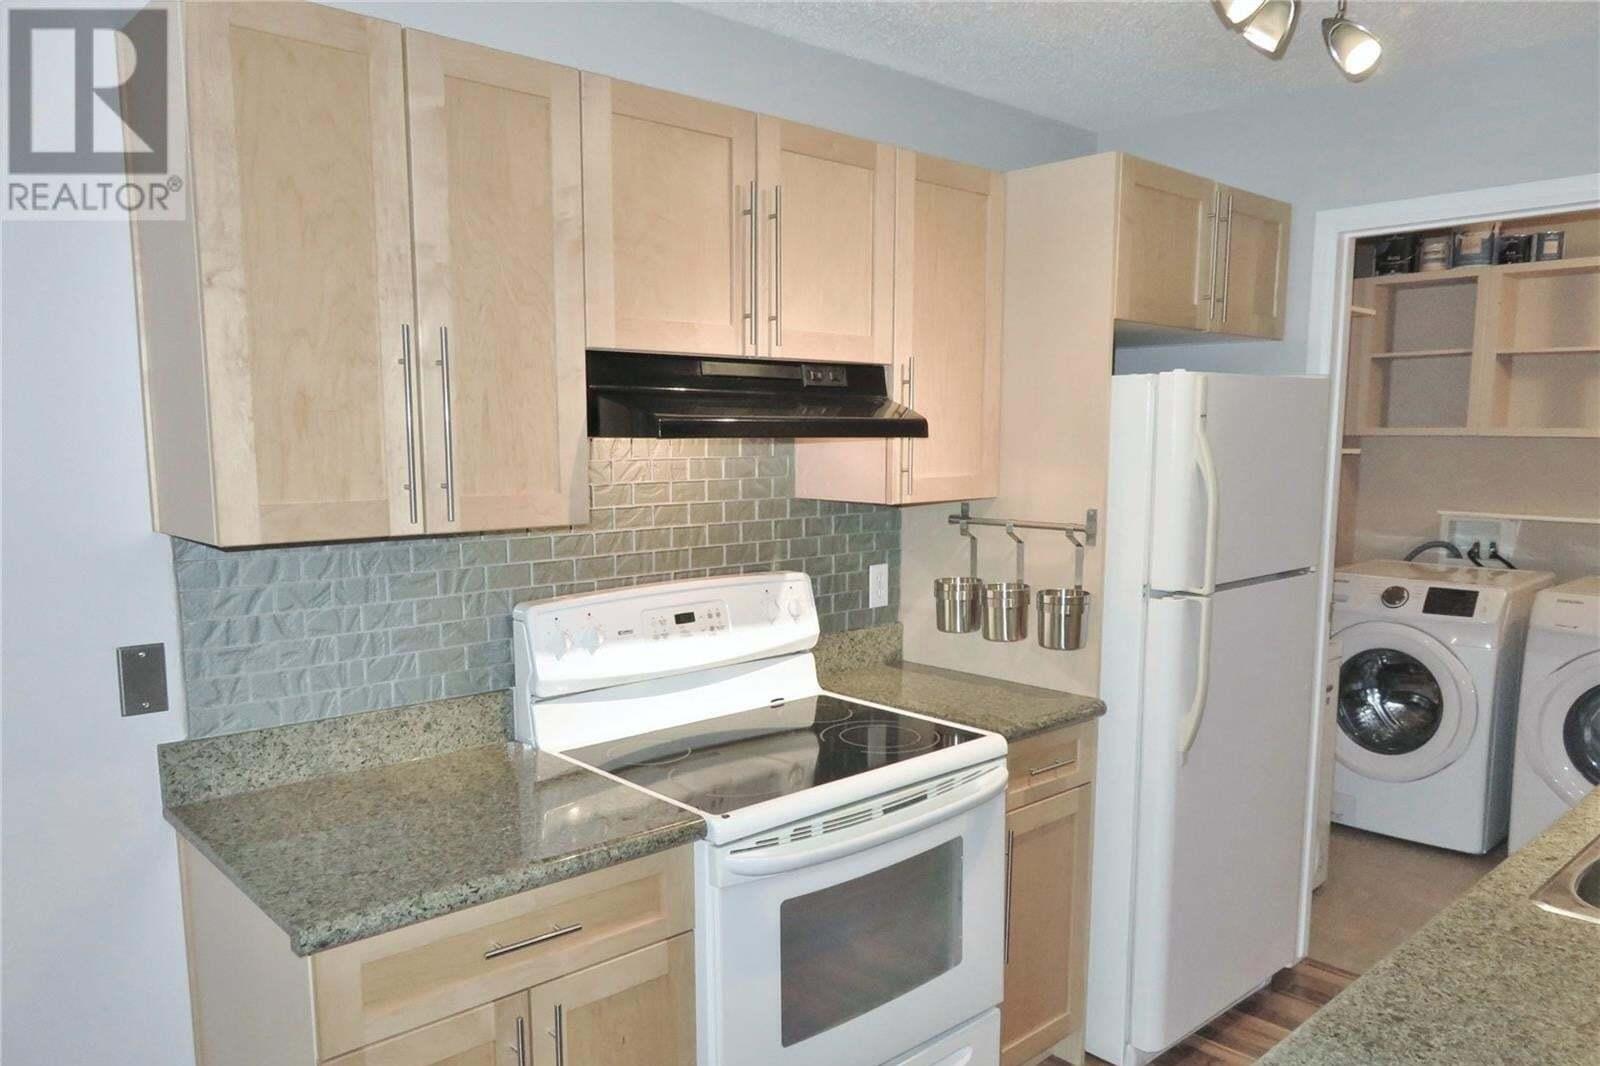 Condo for sale at 333 Silverwood Rd Unit 405 Saskatoon Saskatchewan - MLS: SK830903